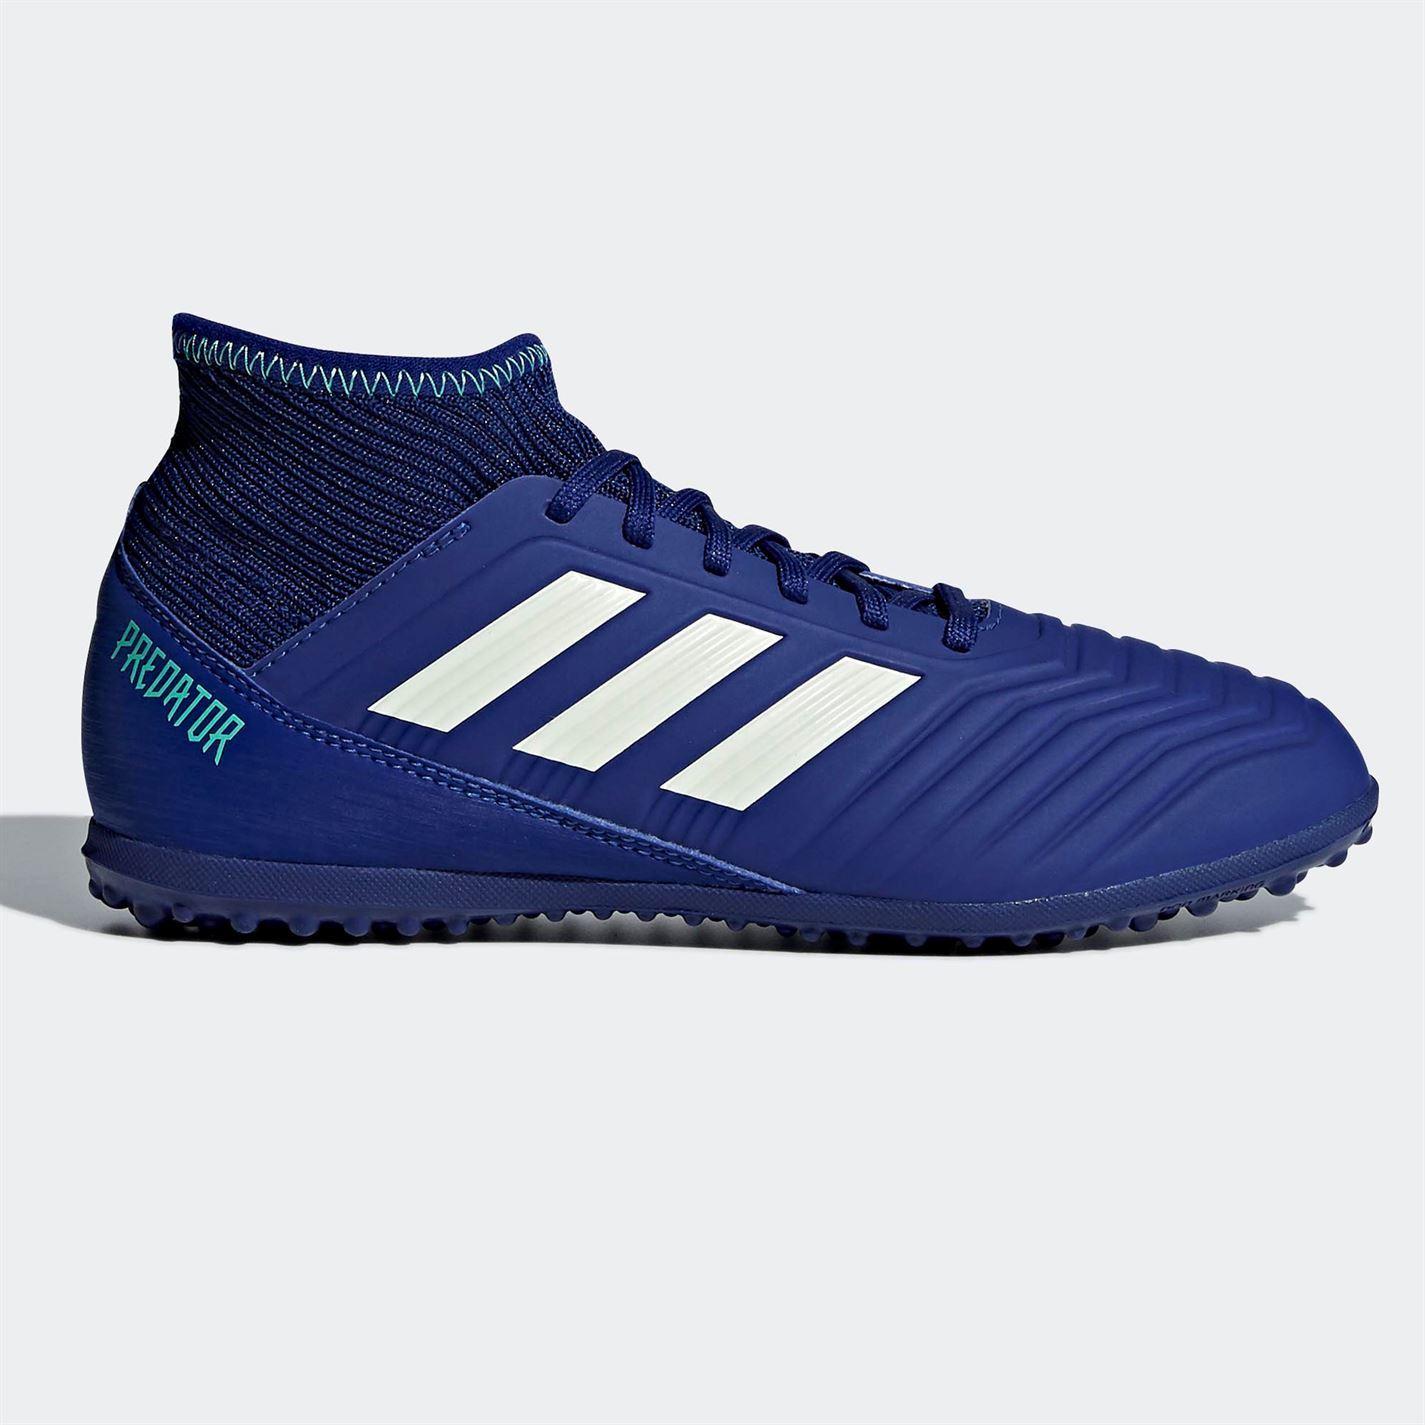 dd2af233fd3 ... firm ground boots 1c807 f42dc  new zealand adidas kids predator tango  18 3 junior astro 69288 fe690